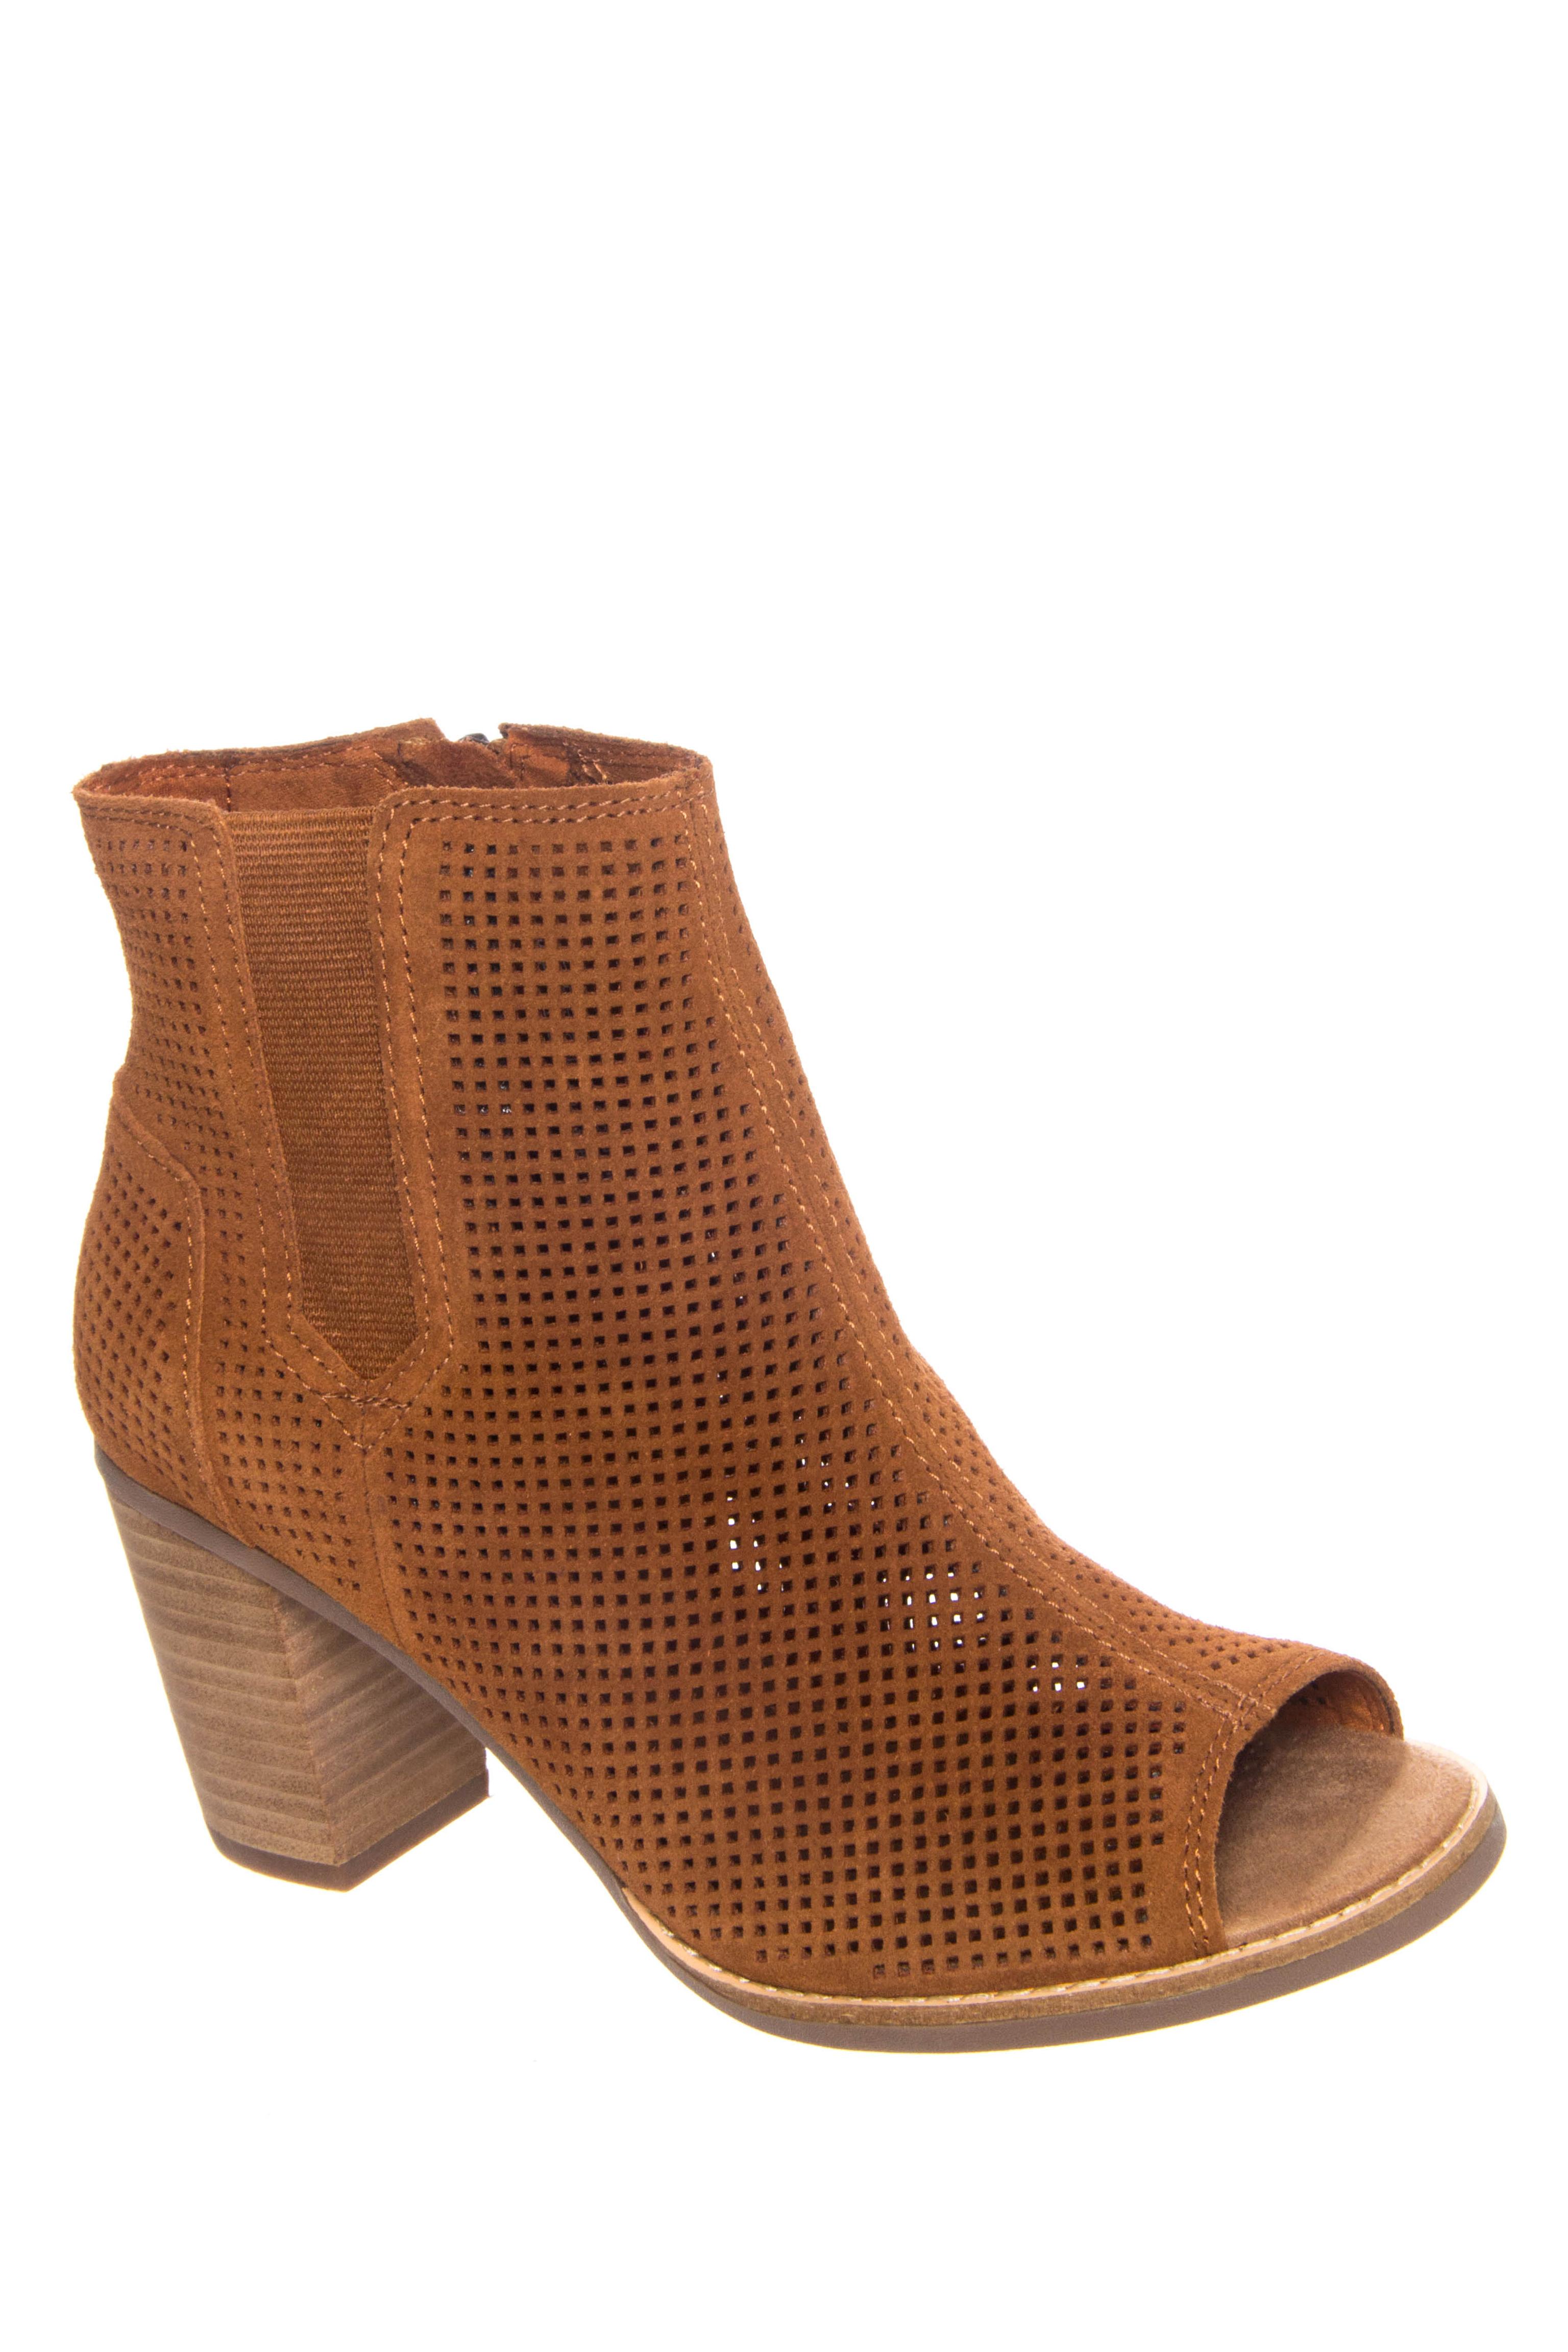 TOMS Majorca Peep Toe Booties - Cinnamon